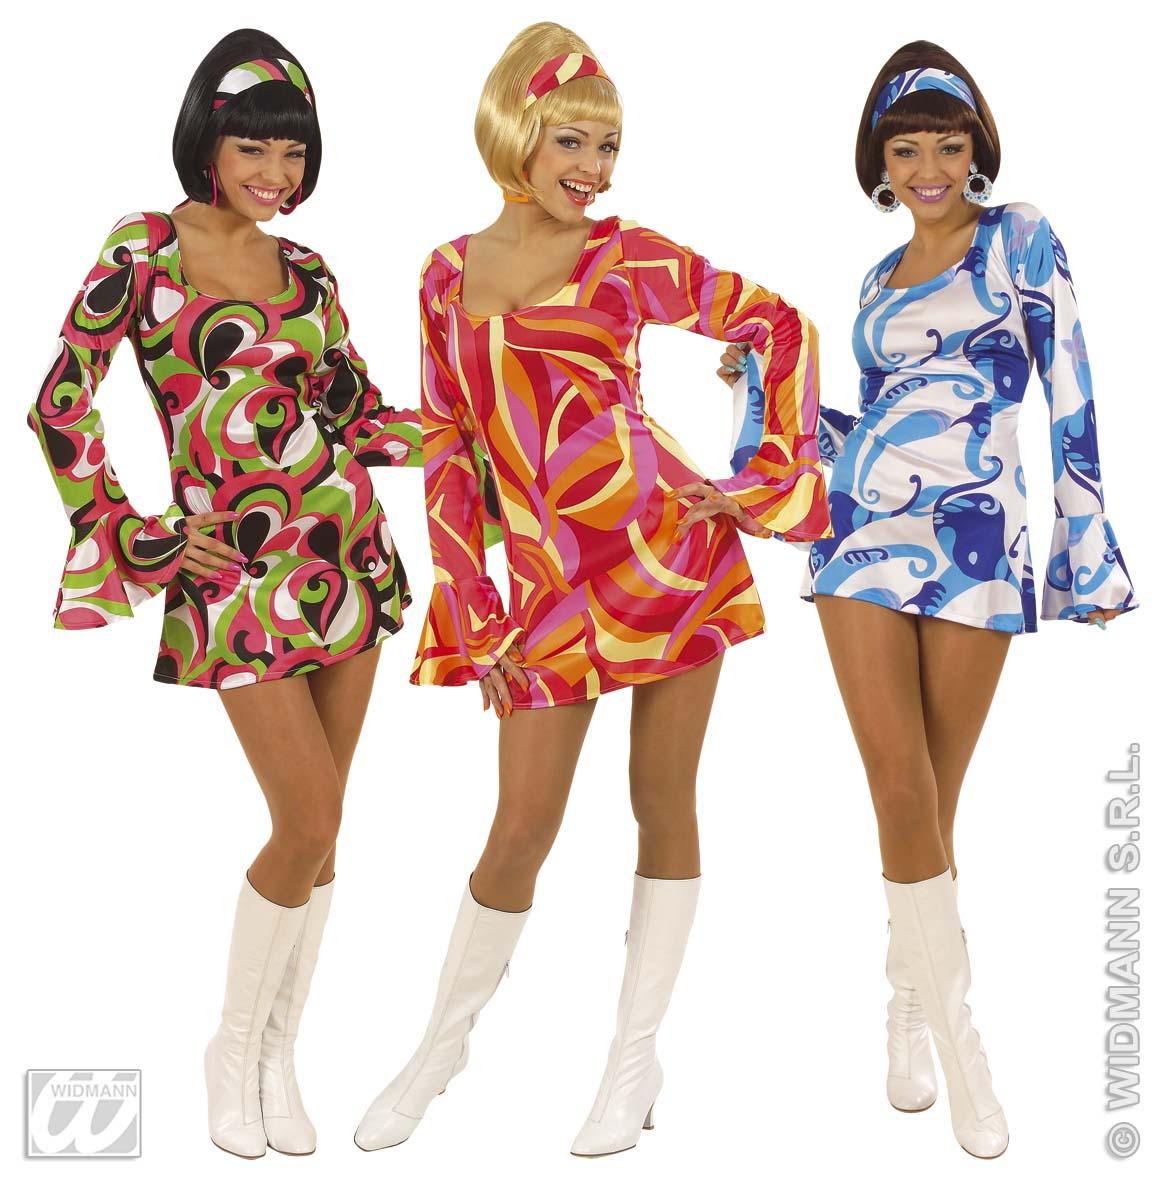 70s chick ladies fancy dress 60s hippy party costume ebay - Vetement annee 70 ...